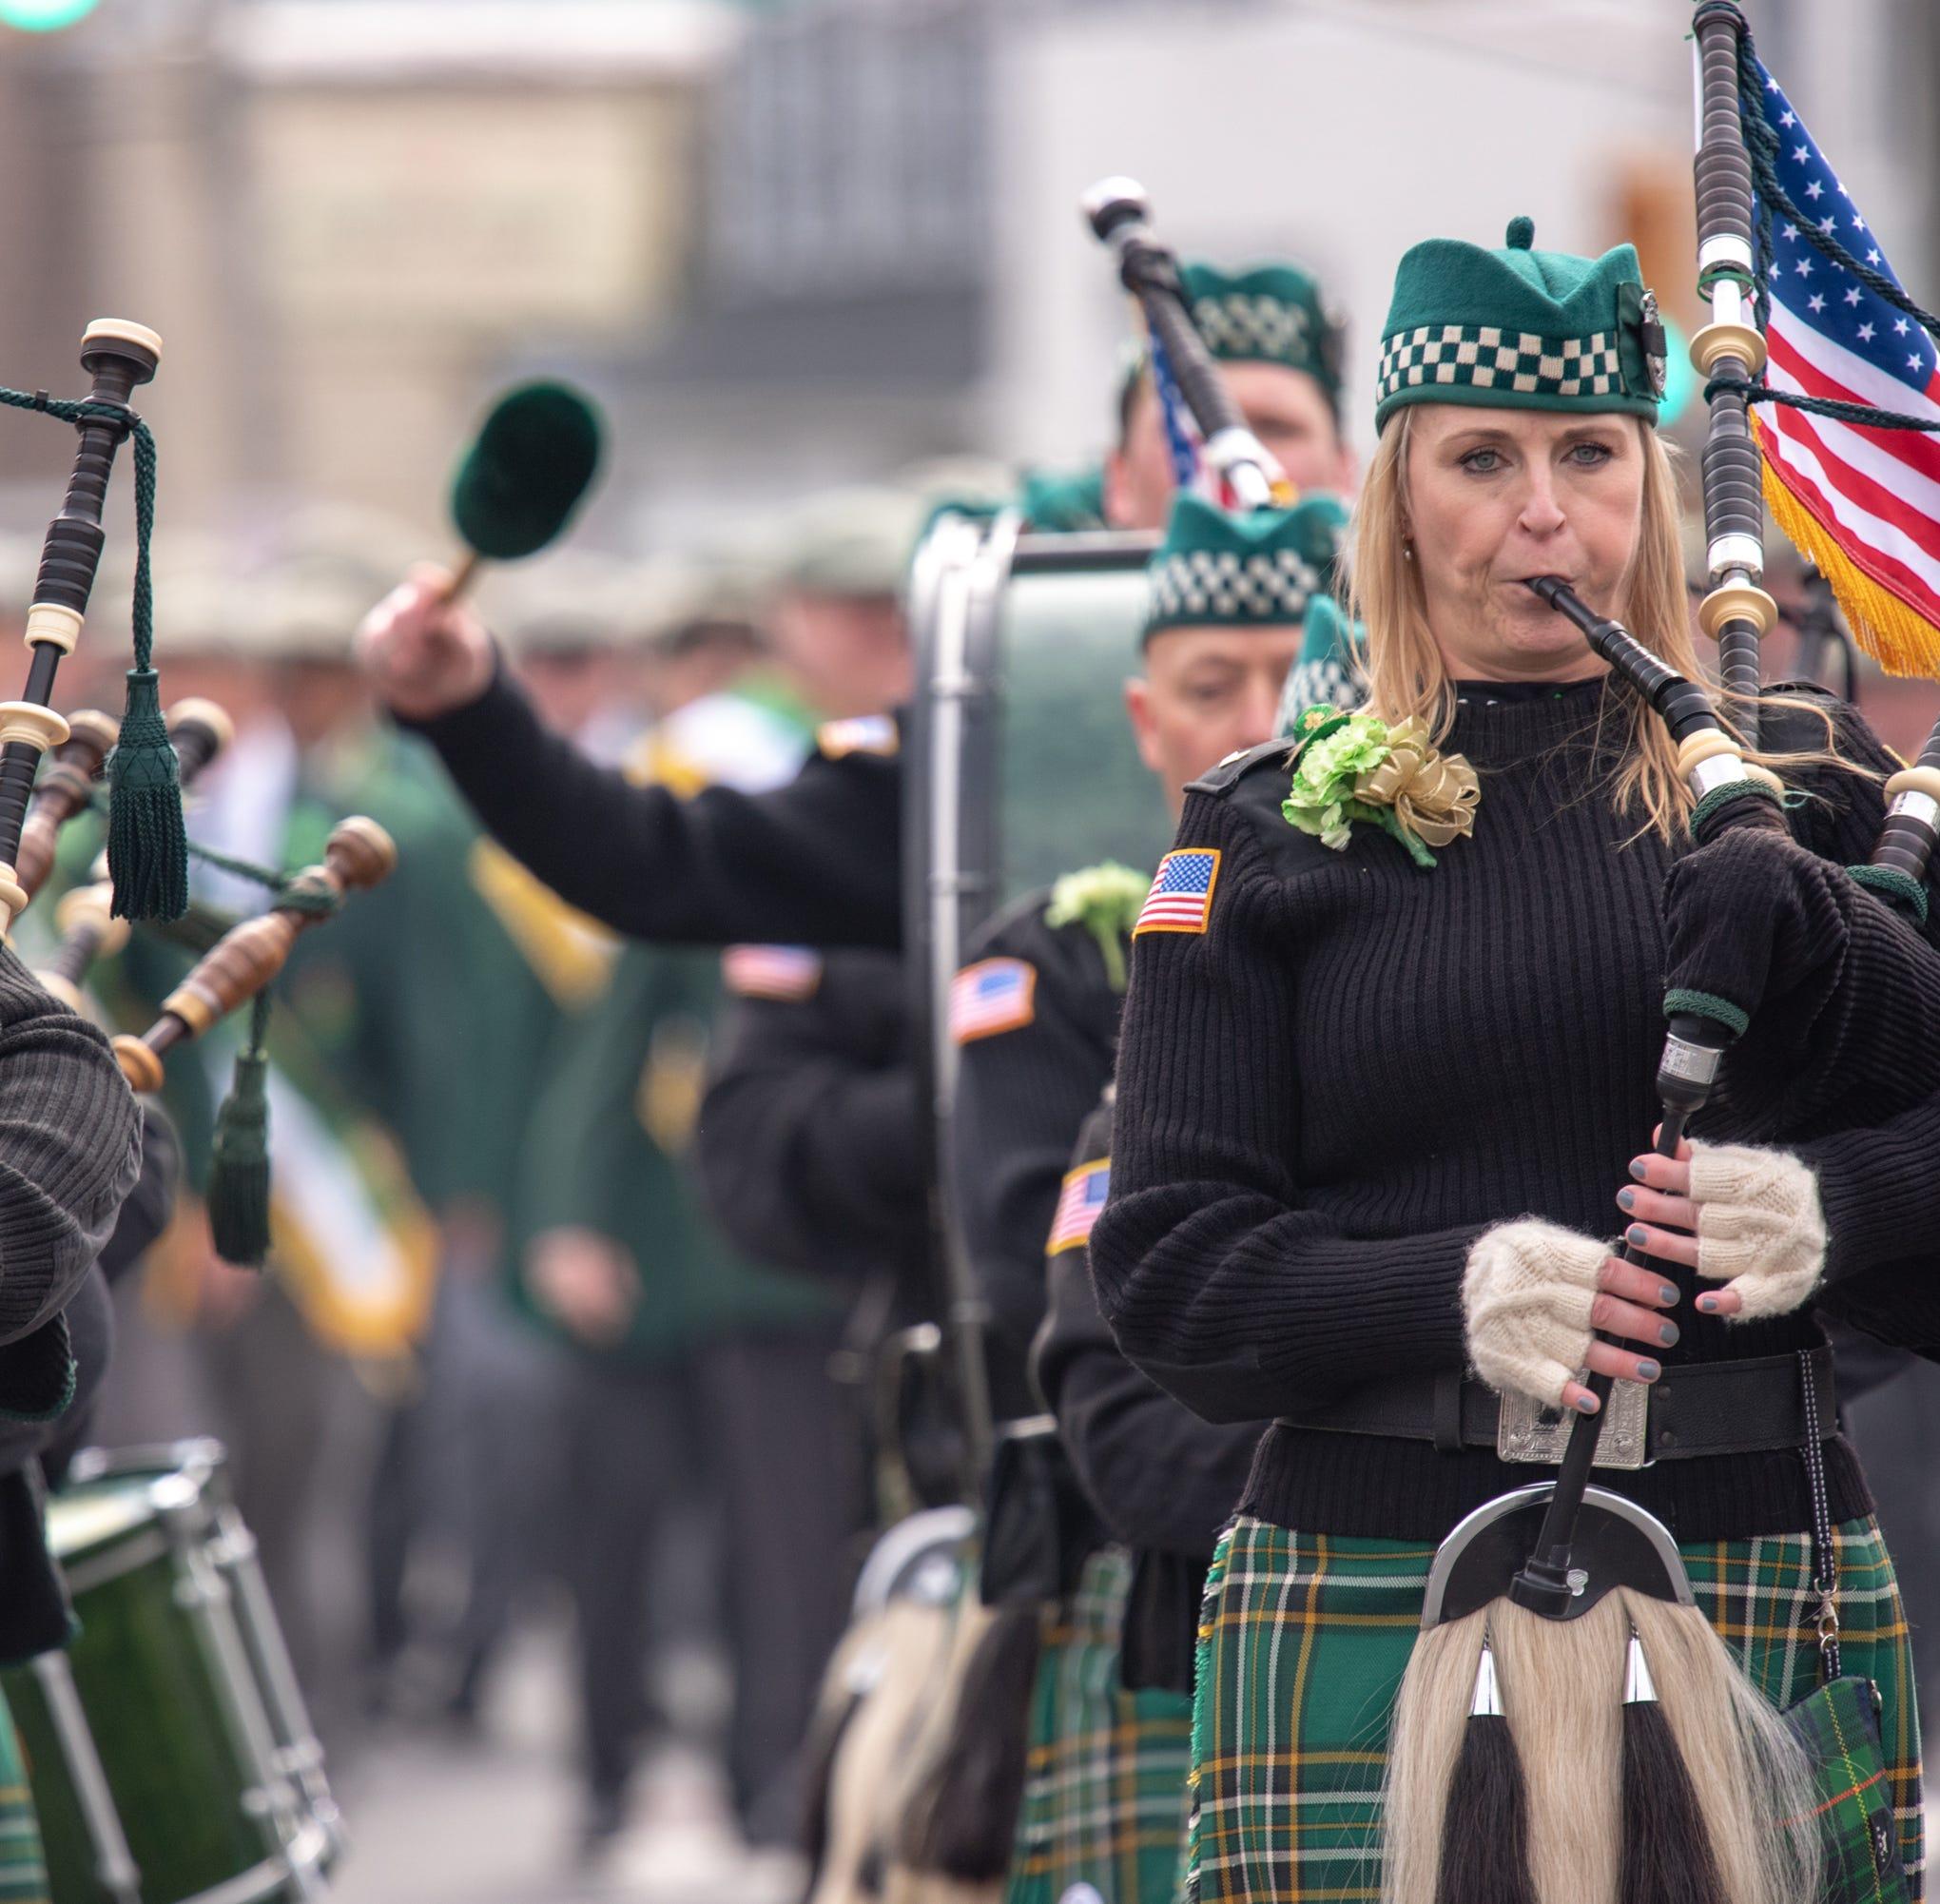 Belmar Lake Como St. Patrick's Day Parade marches despite impending snow storm